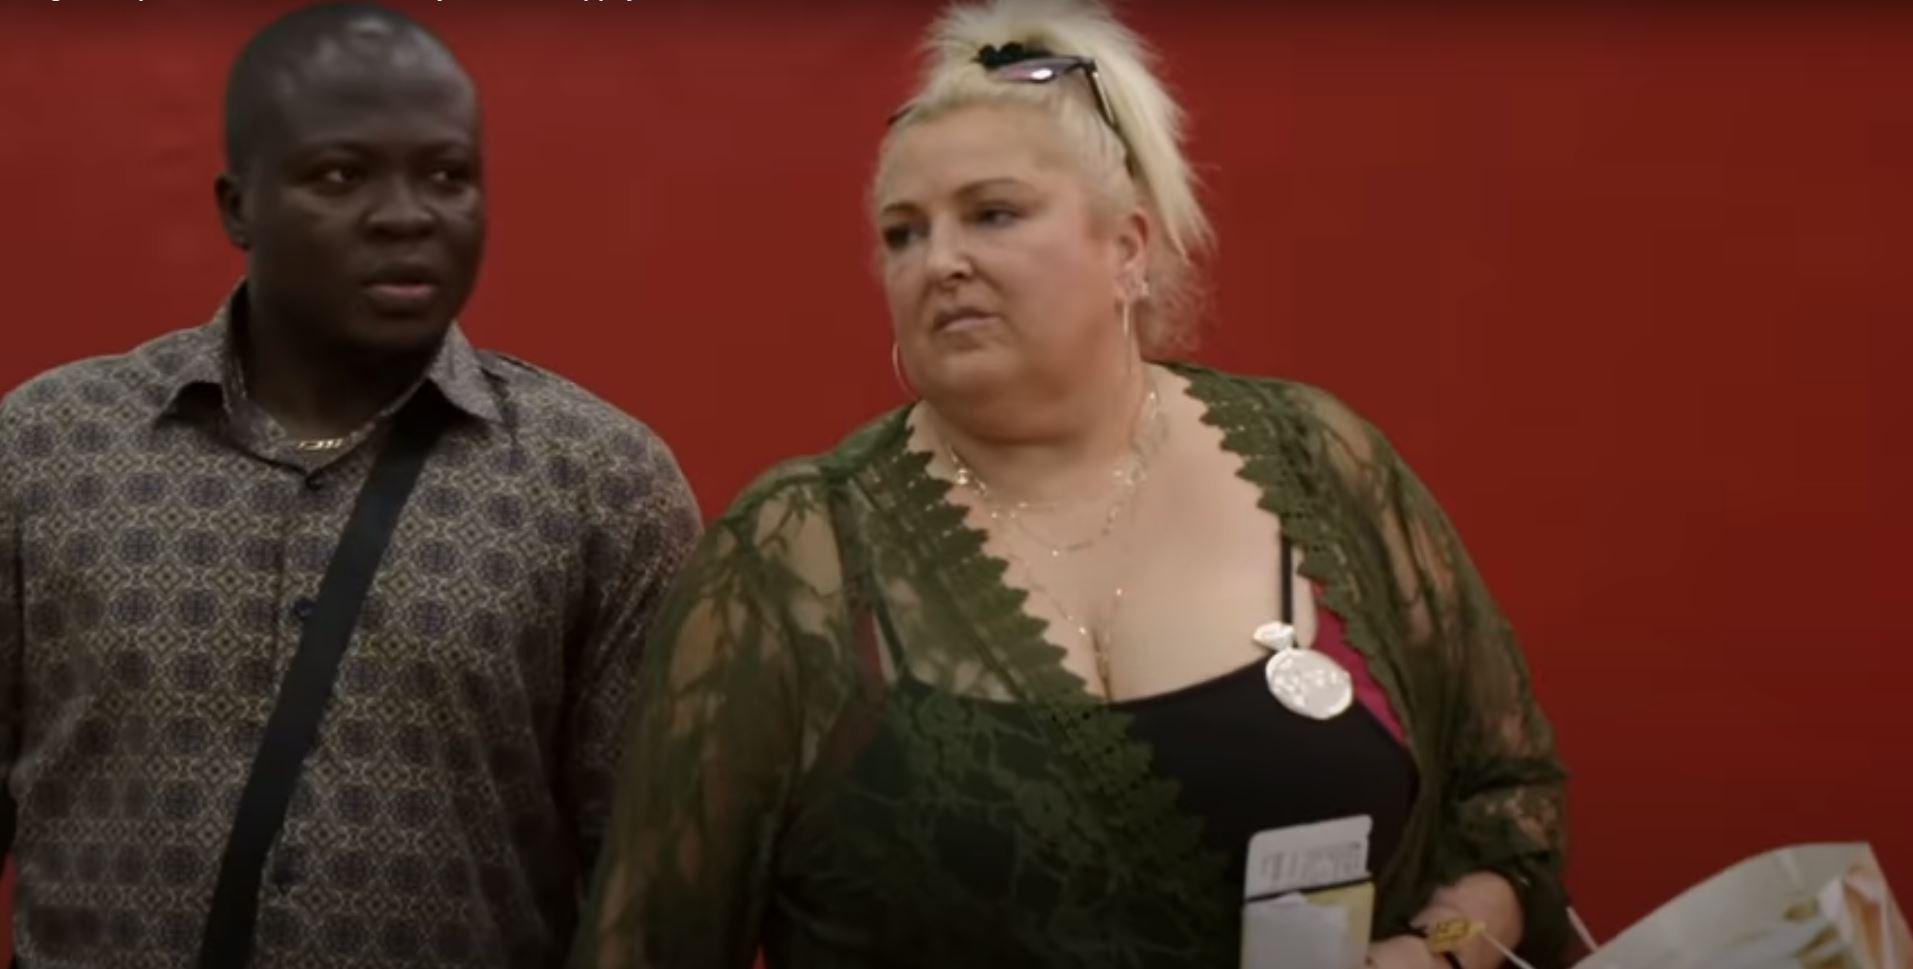 90 Day Fiancé stars Angela Deem and Michael Ilesanmi